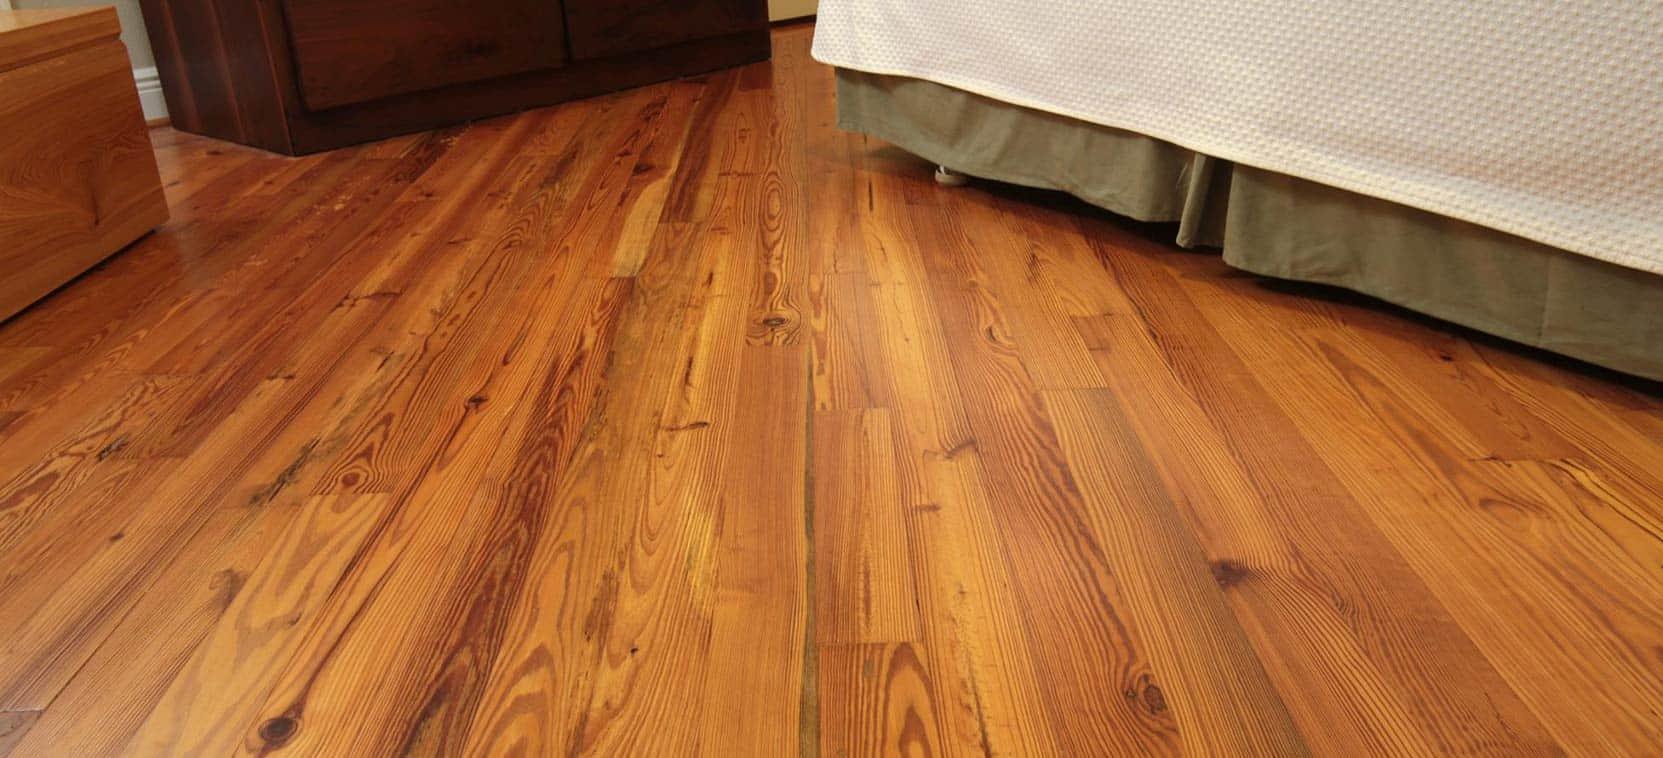 Wood Flooring Professionals Goodwin Company Heart Pine